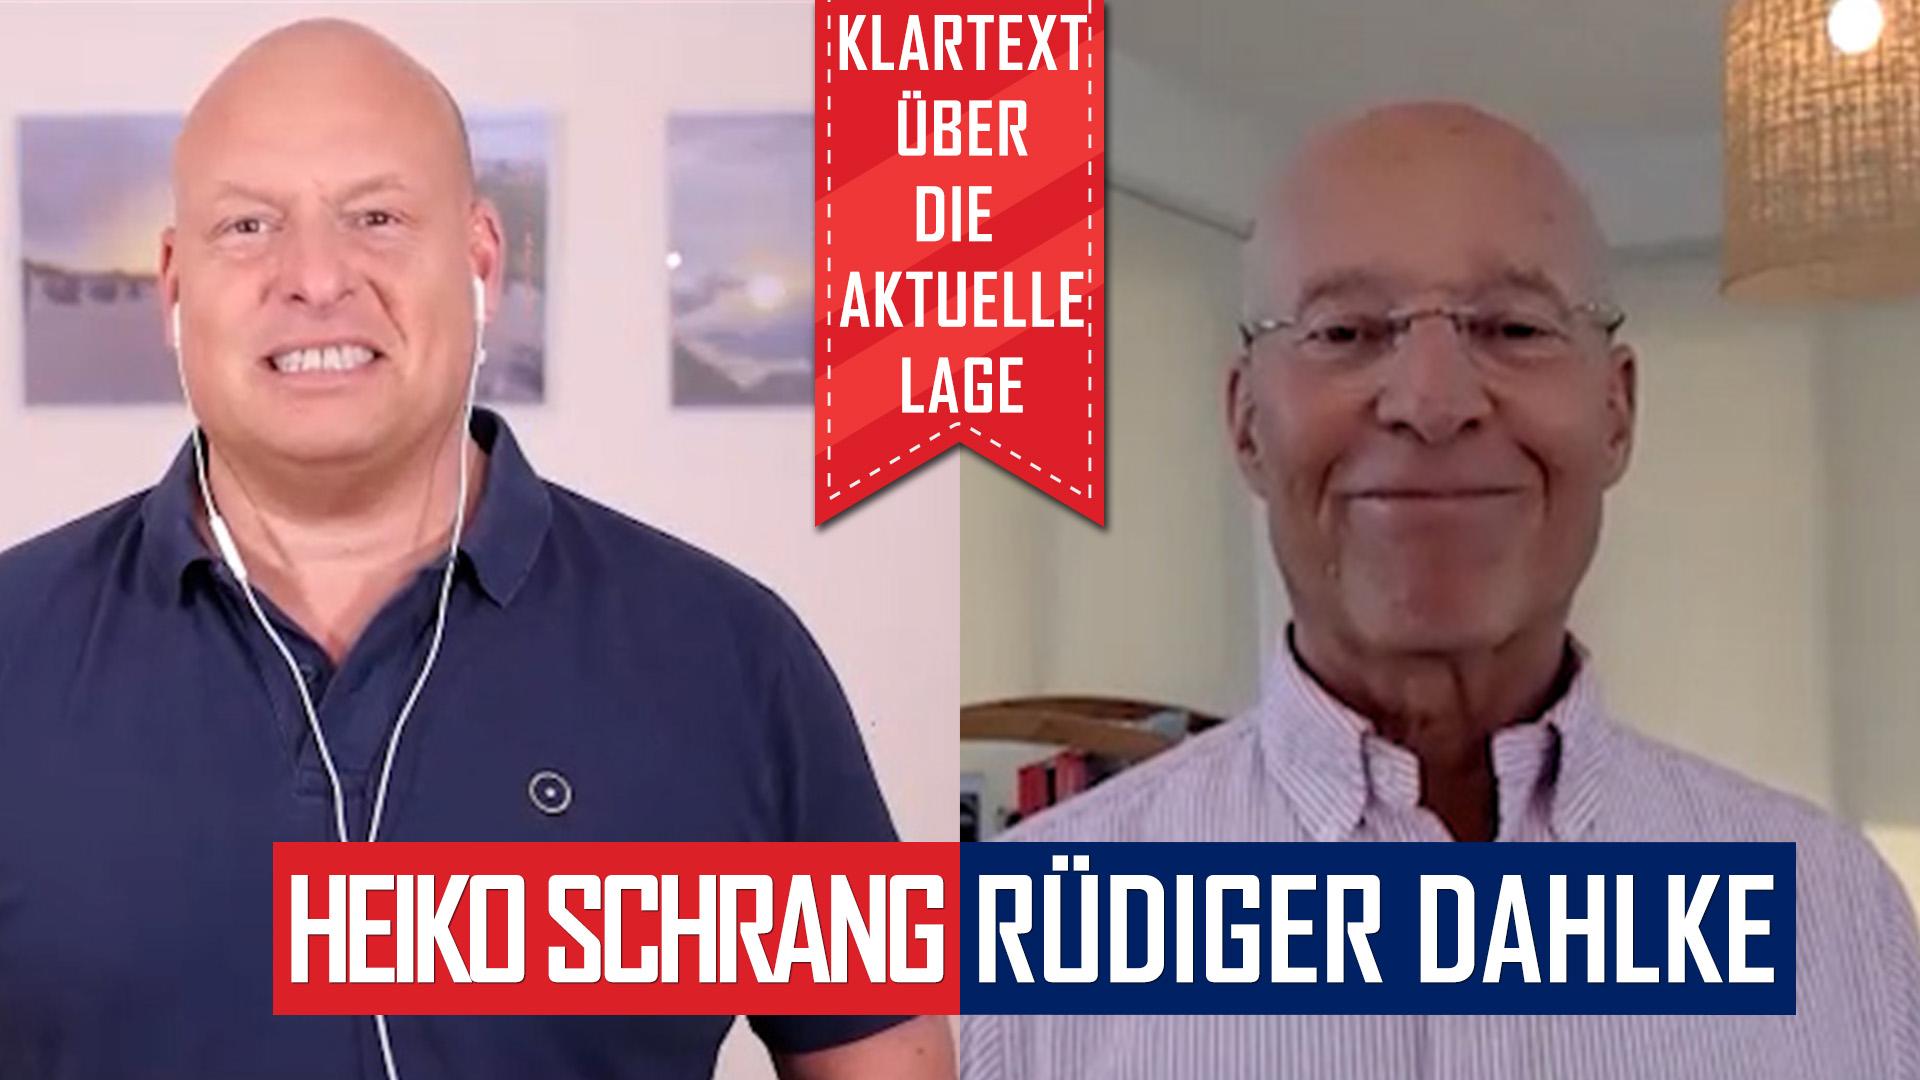 KLARTEXT: Dr. Rüdiger Dahlke über die aktuelle Corona-Situation!